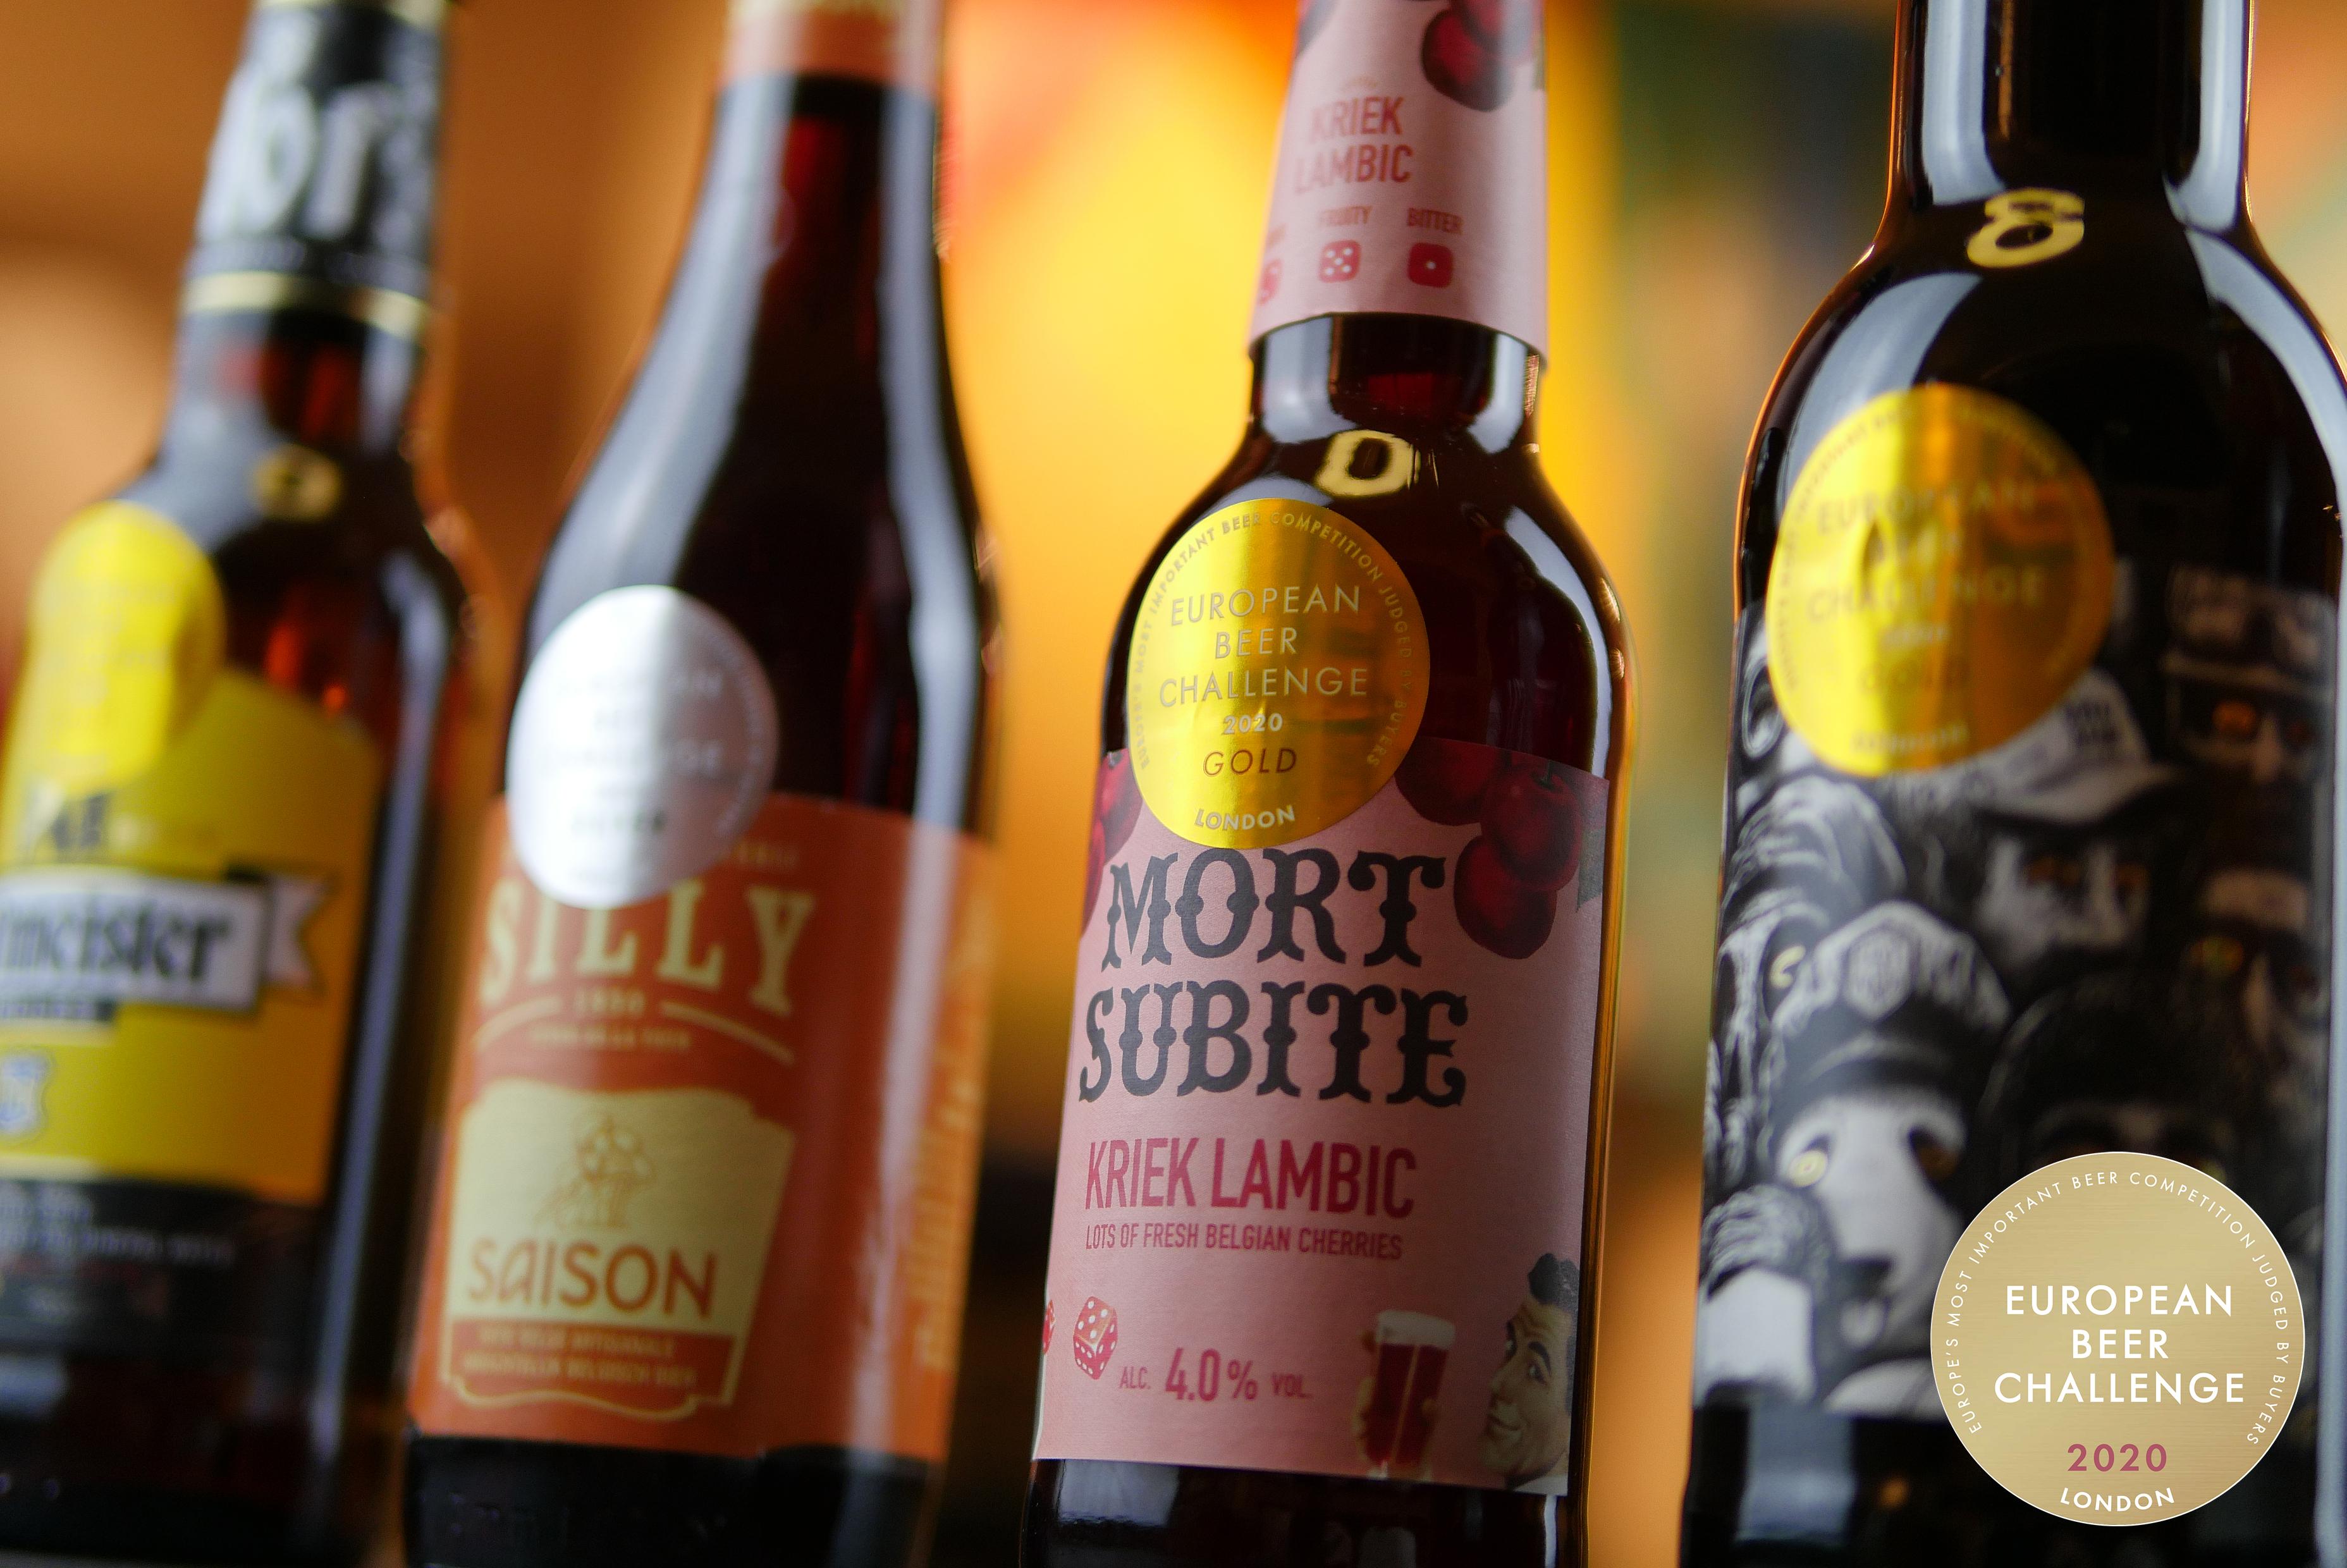 Tri piva Varionice dobitnici su Oscara među pivima – The European Beer Challenge 2020